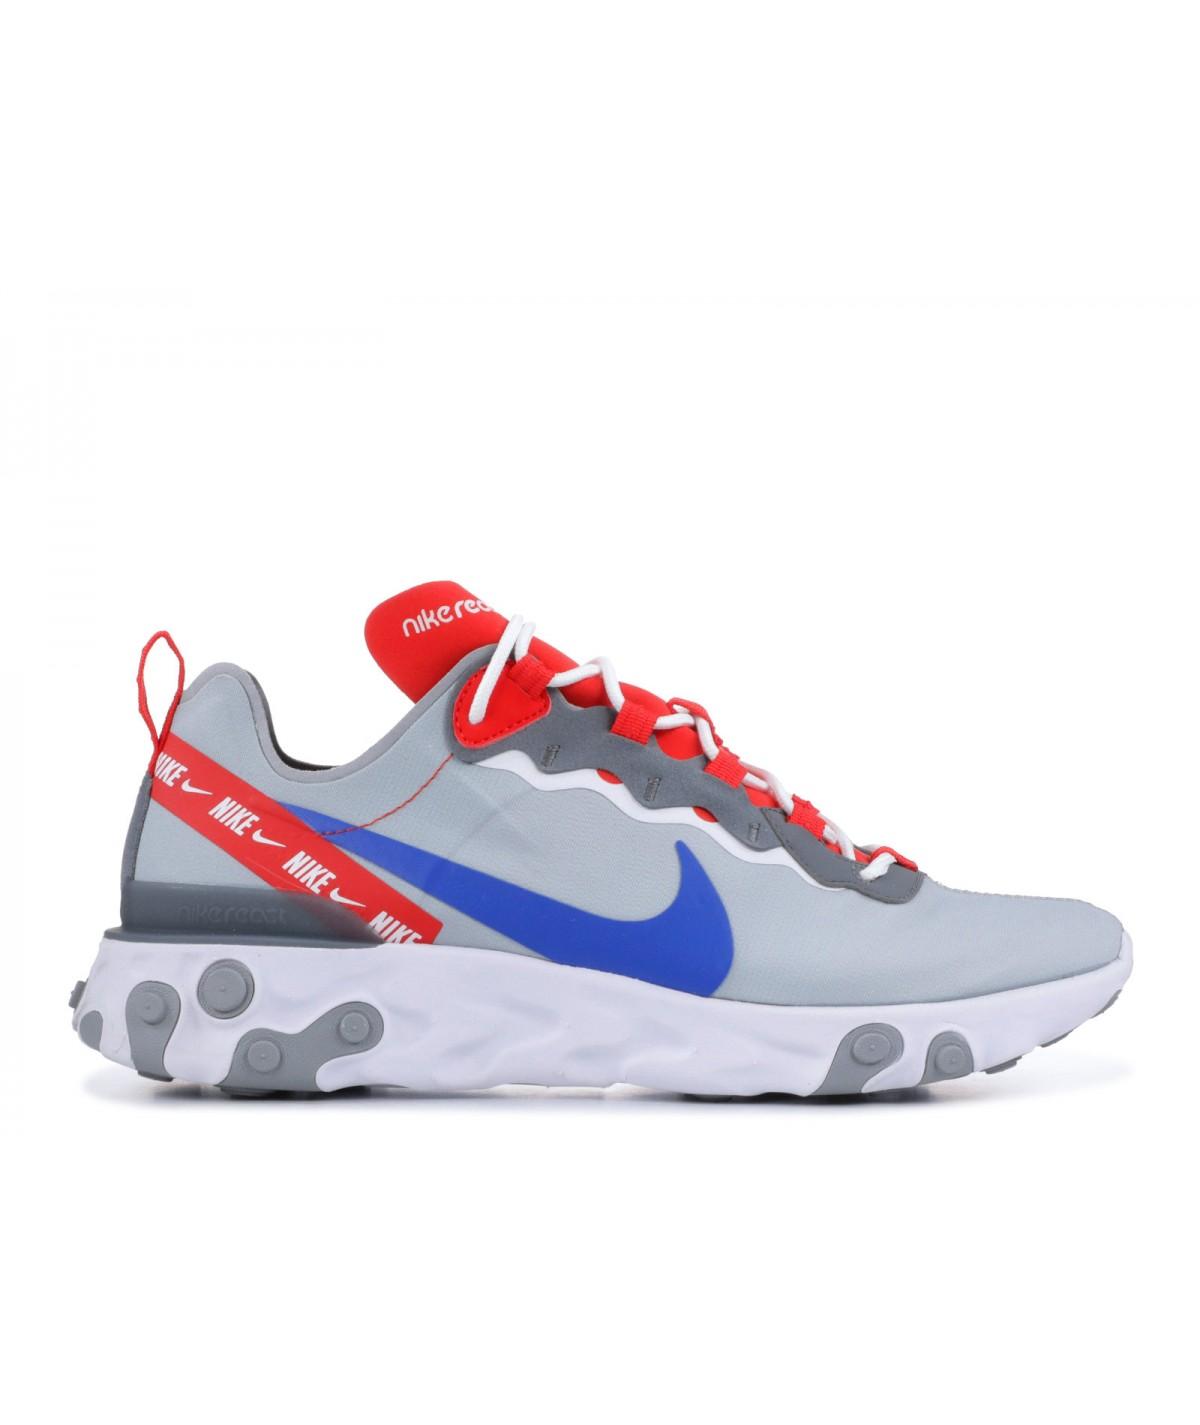 Nike React 55 Gris I Chaussure Authentique I Livraison Guadeloupe